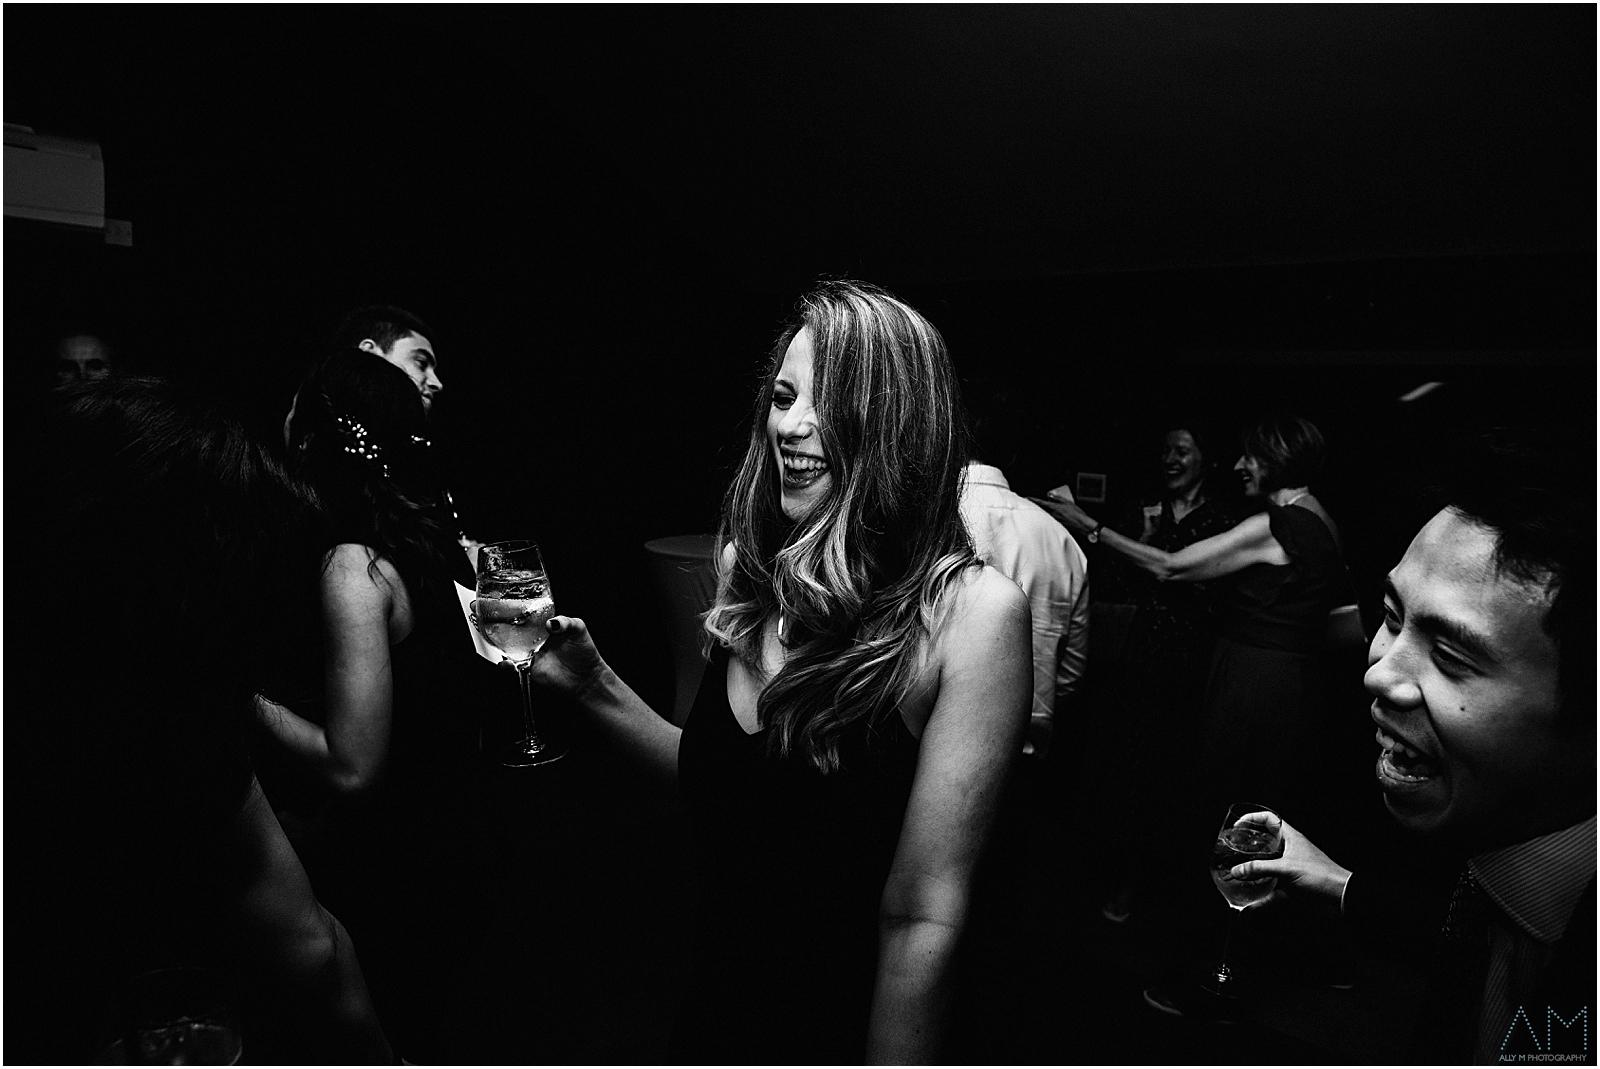 Drinks on the dancefloor